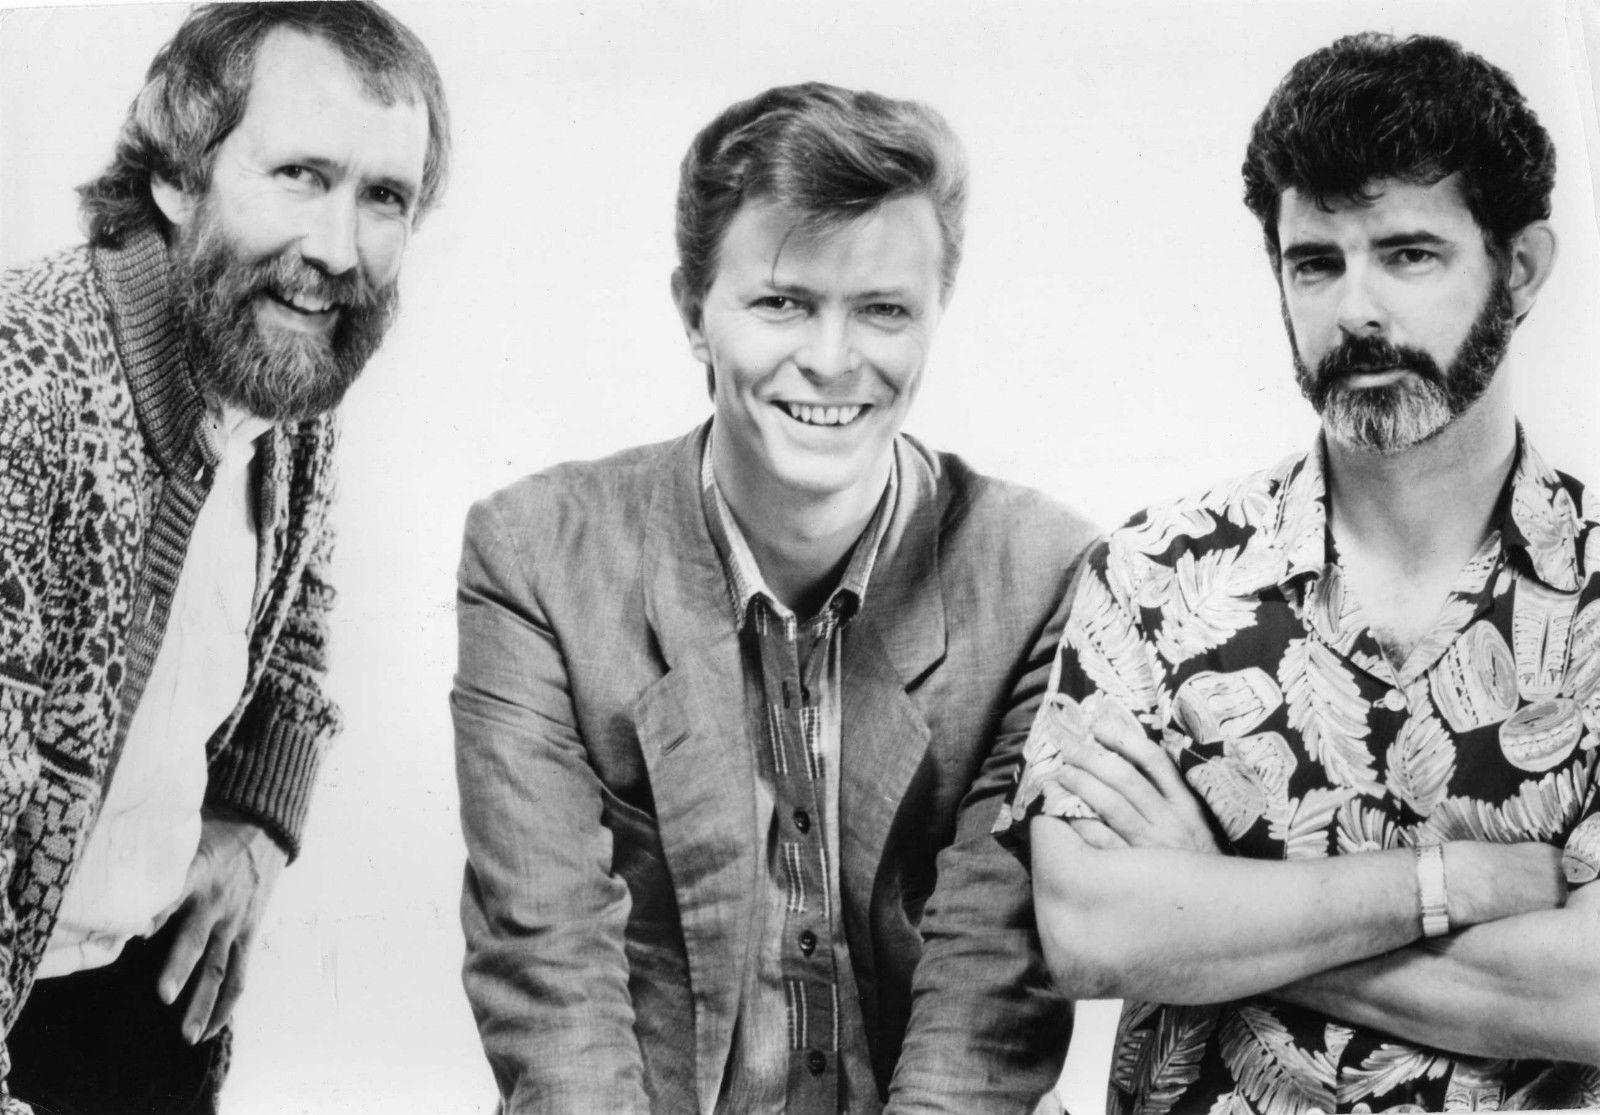 Jim Henson, David Bowie, George Lucas